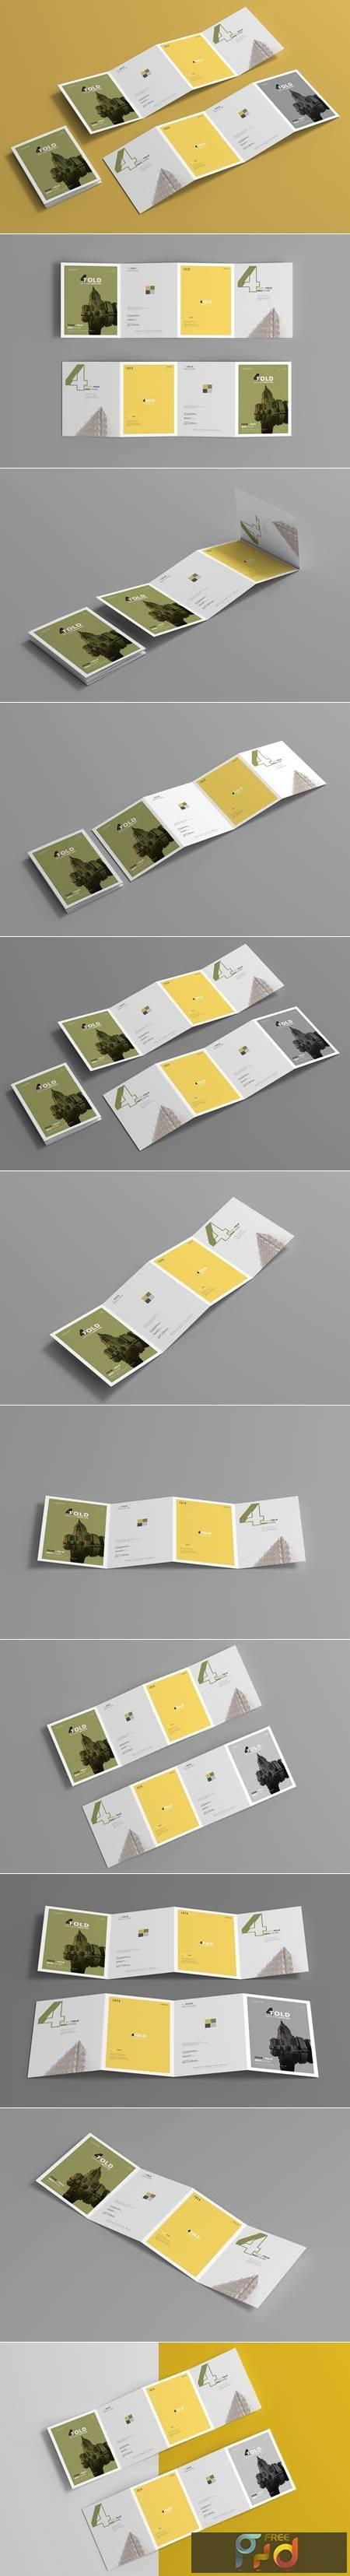 A4 Four Fold Brochure Mockups 4657765 1